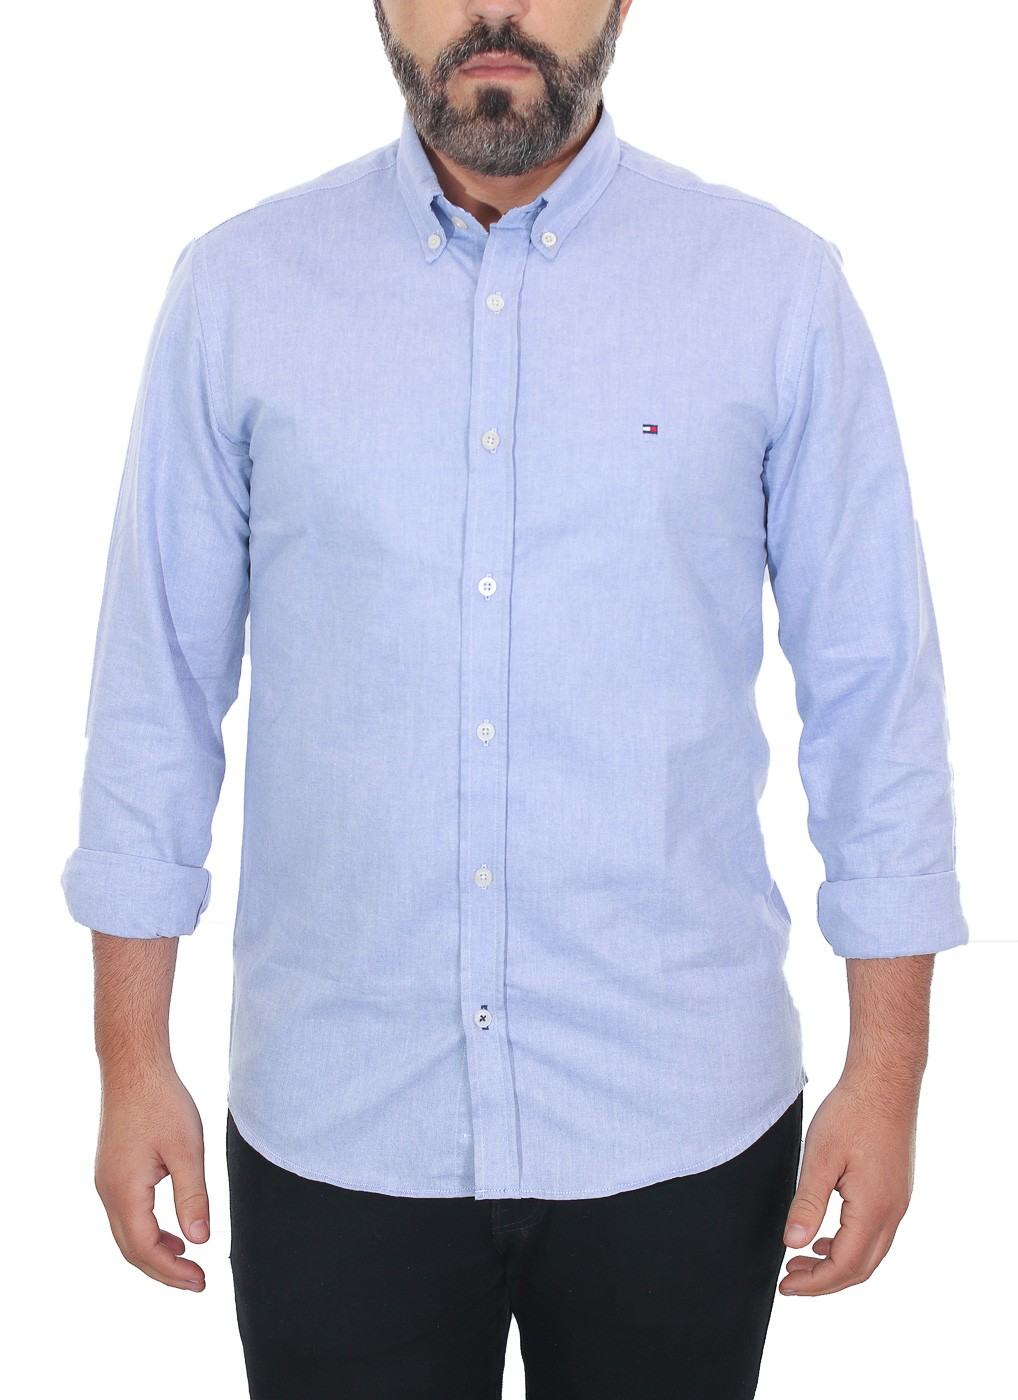 Camisa Tommy Hilfiger Masculina Regular Fit Cotton Oxford Azul Aço